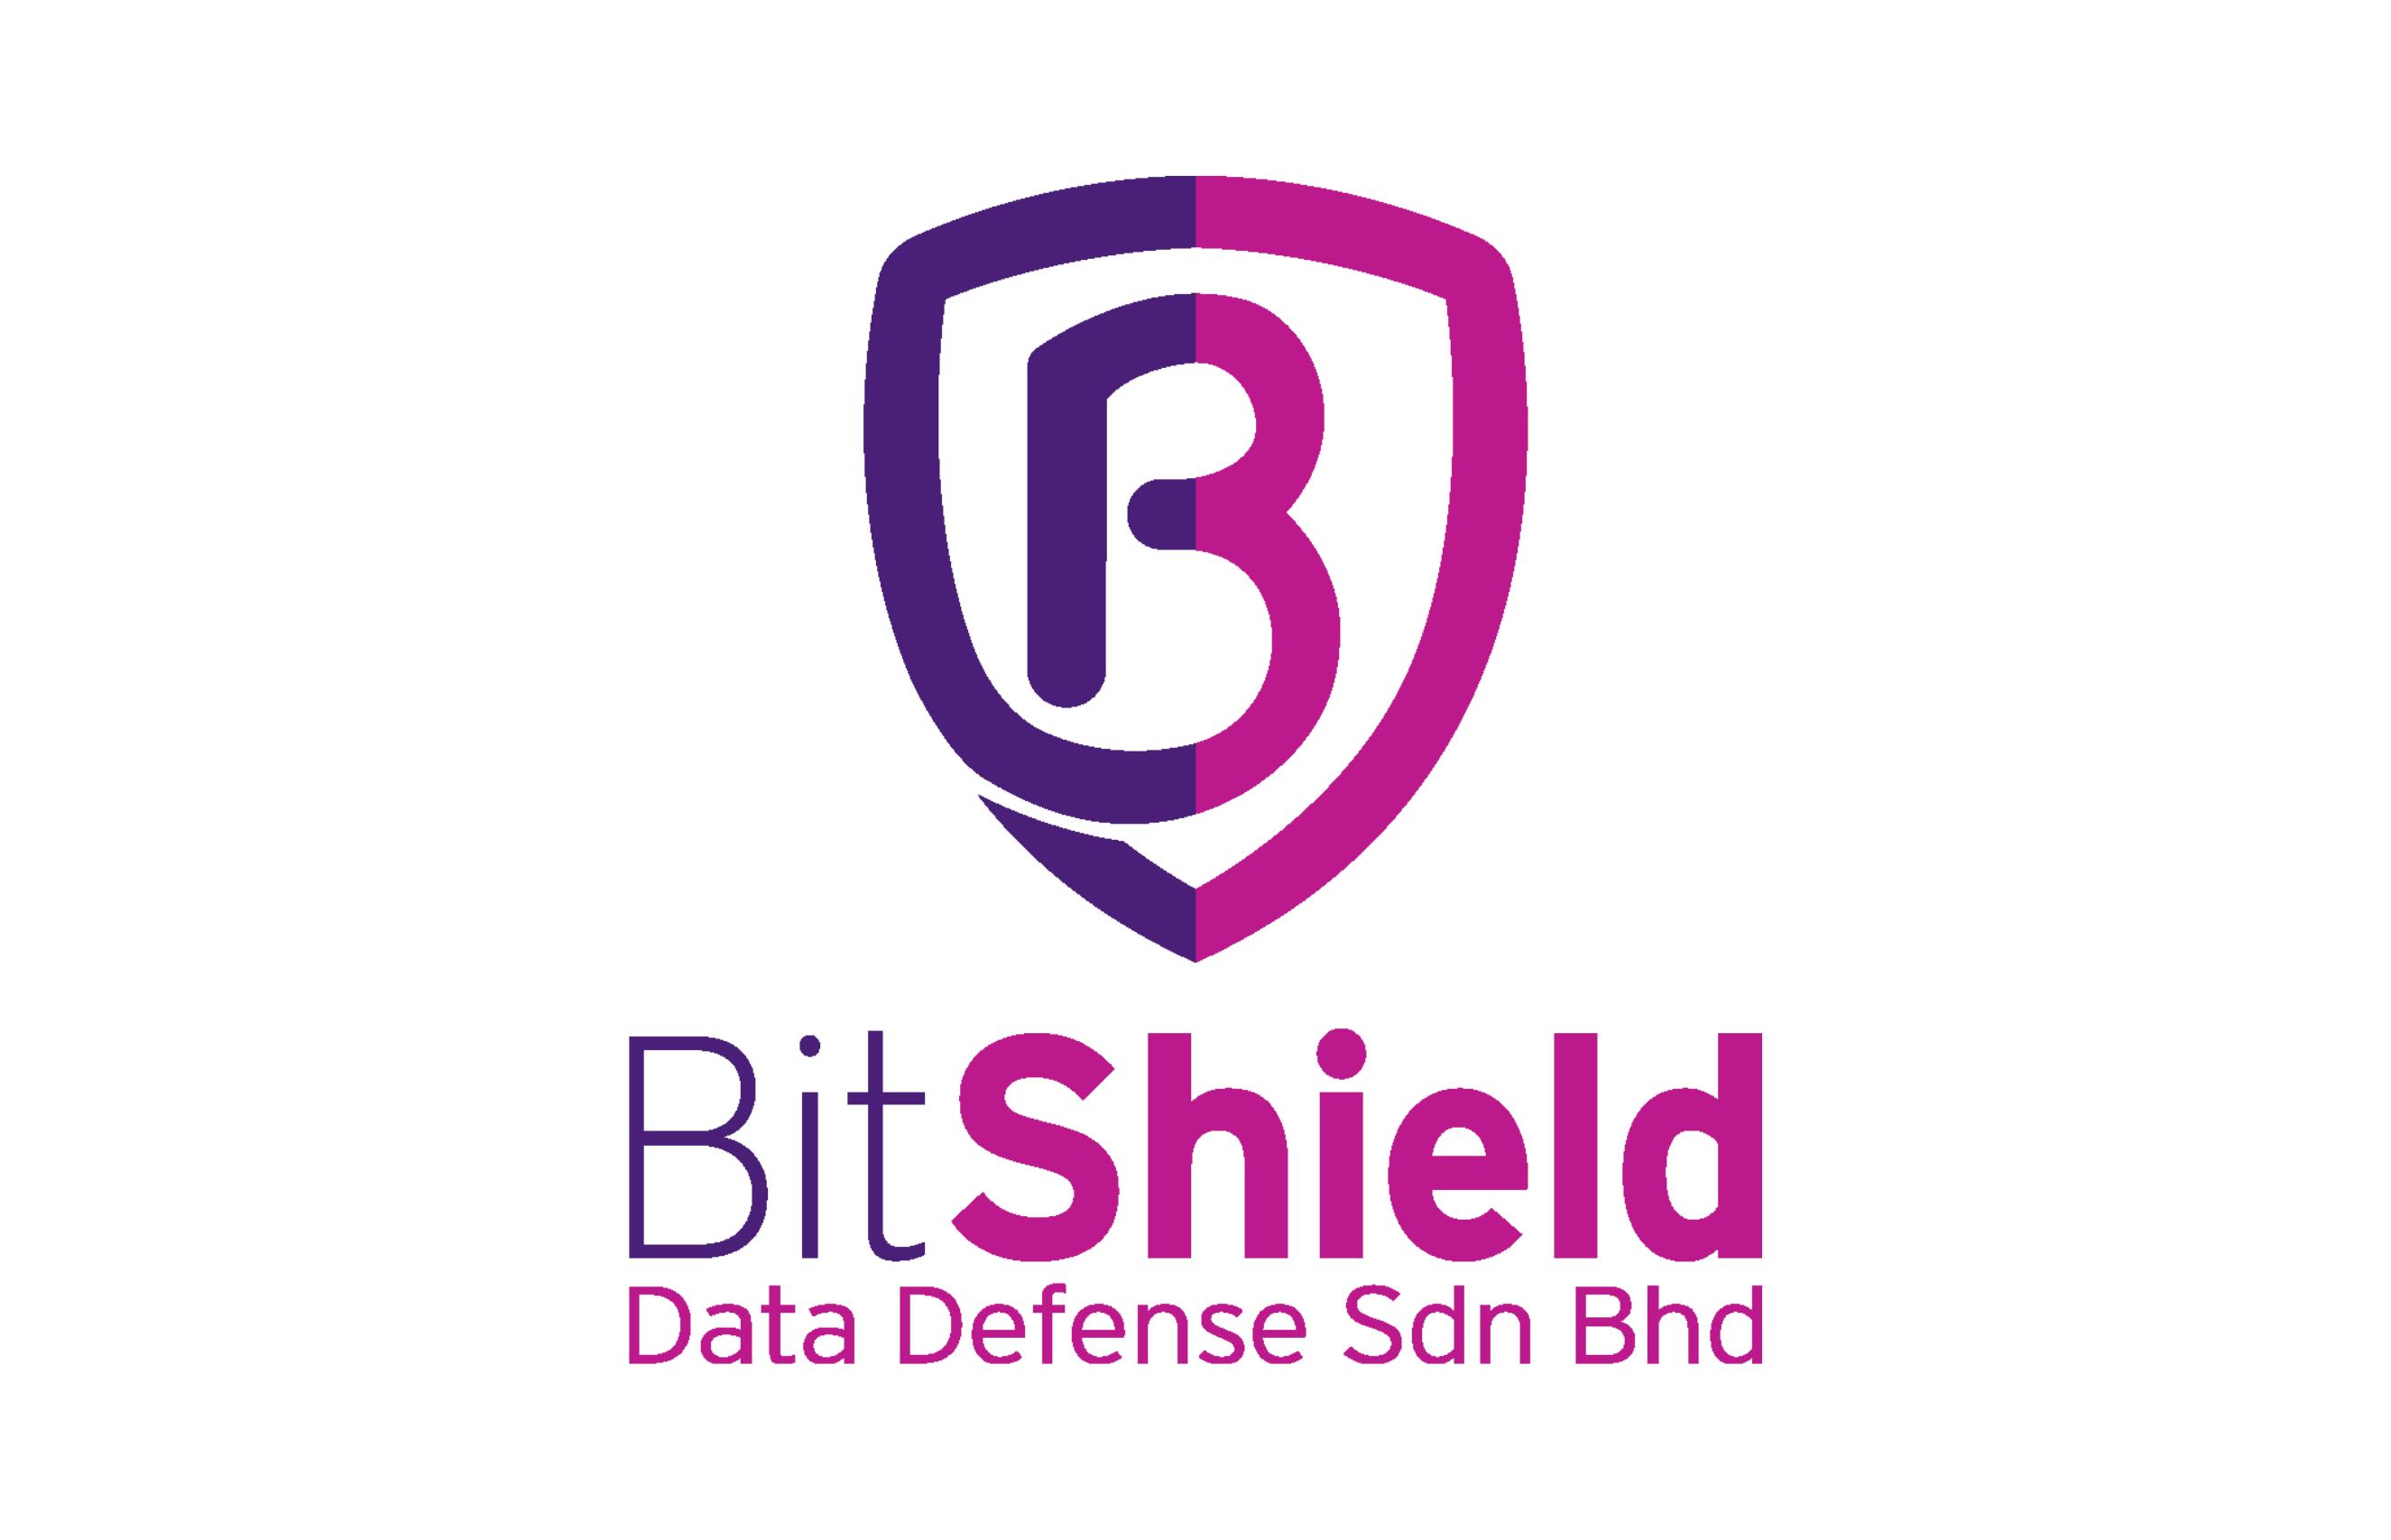 Bitshield Data Defense Sdn. Bhd.